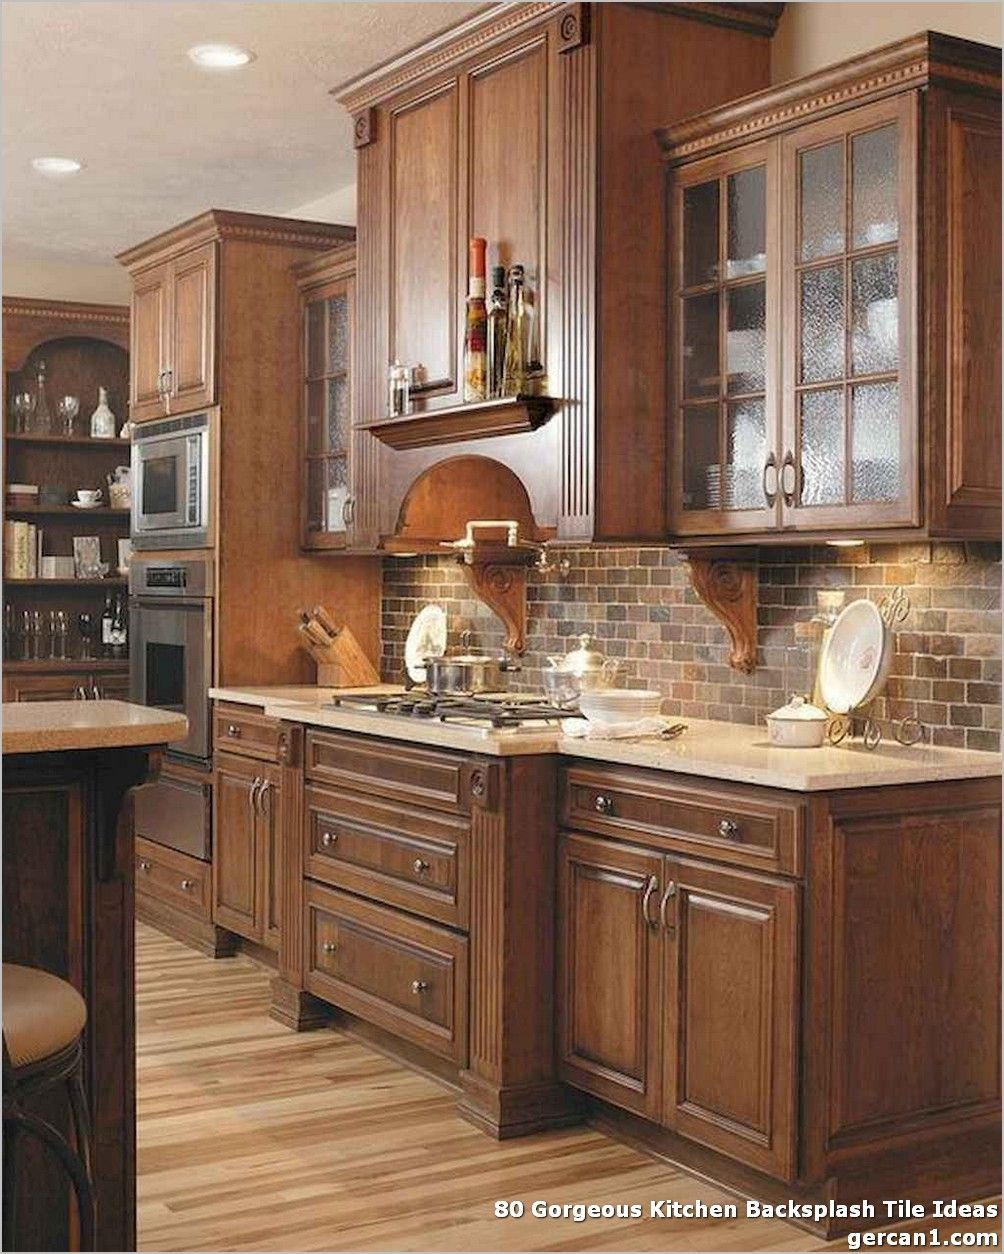 80 Gorgeous Kitchen Backsplash Tile Ideas New Kitchen Cabinets Brick Backsplash Kitchen Craftsman Kitchen